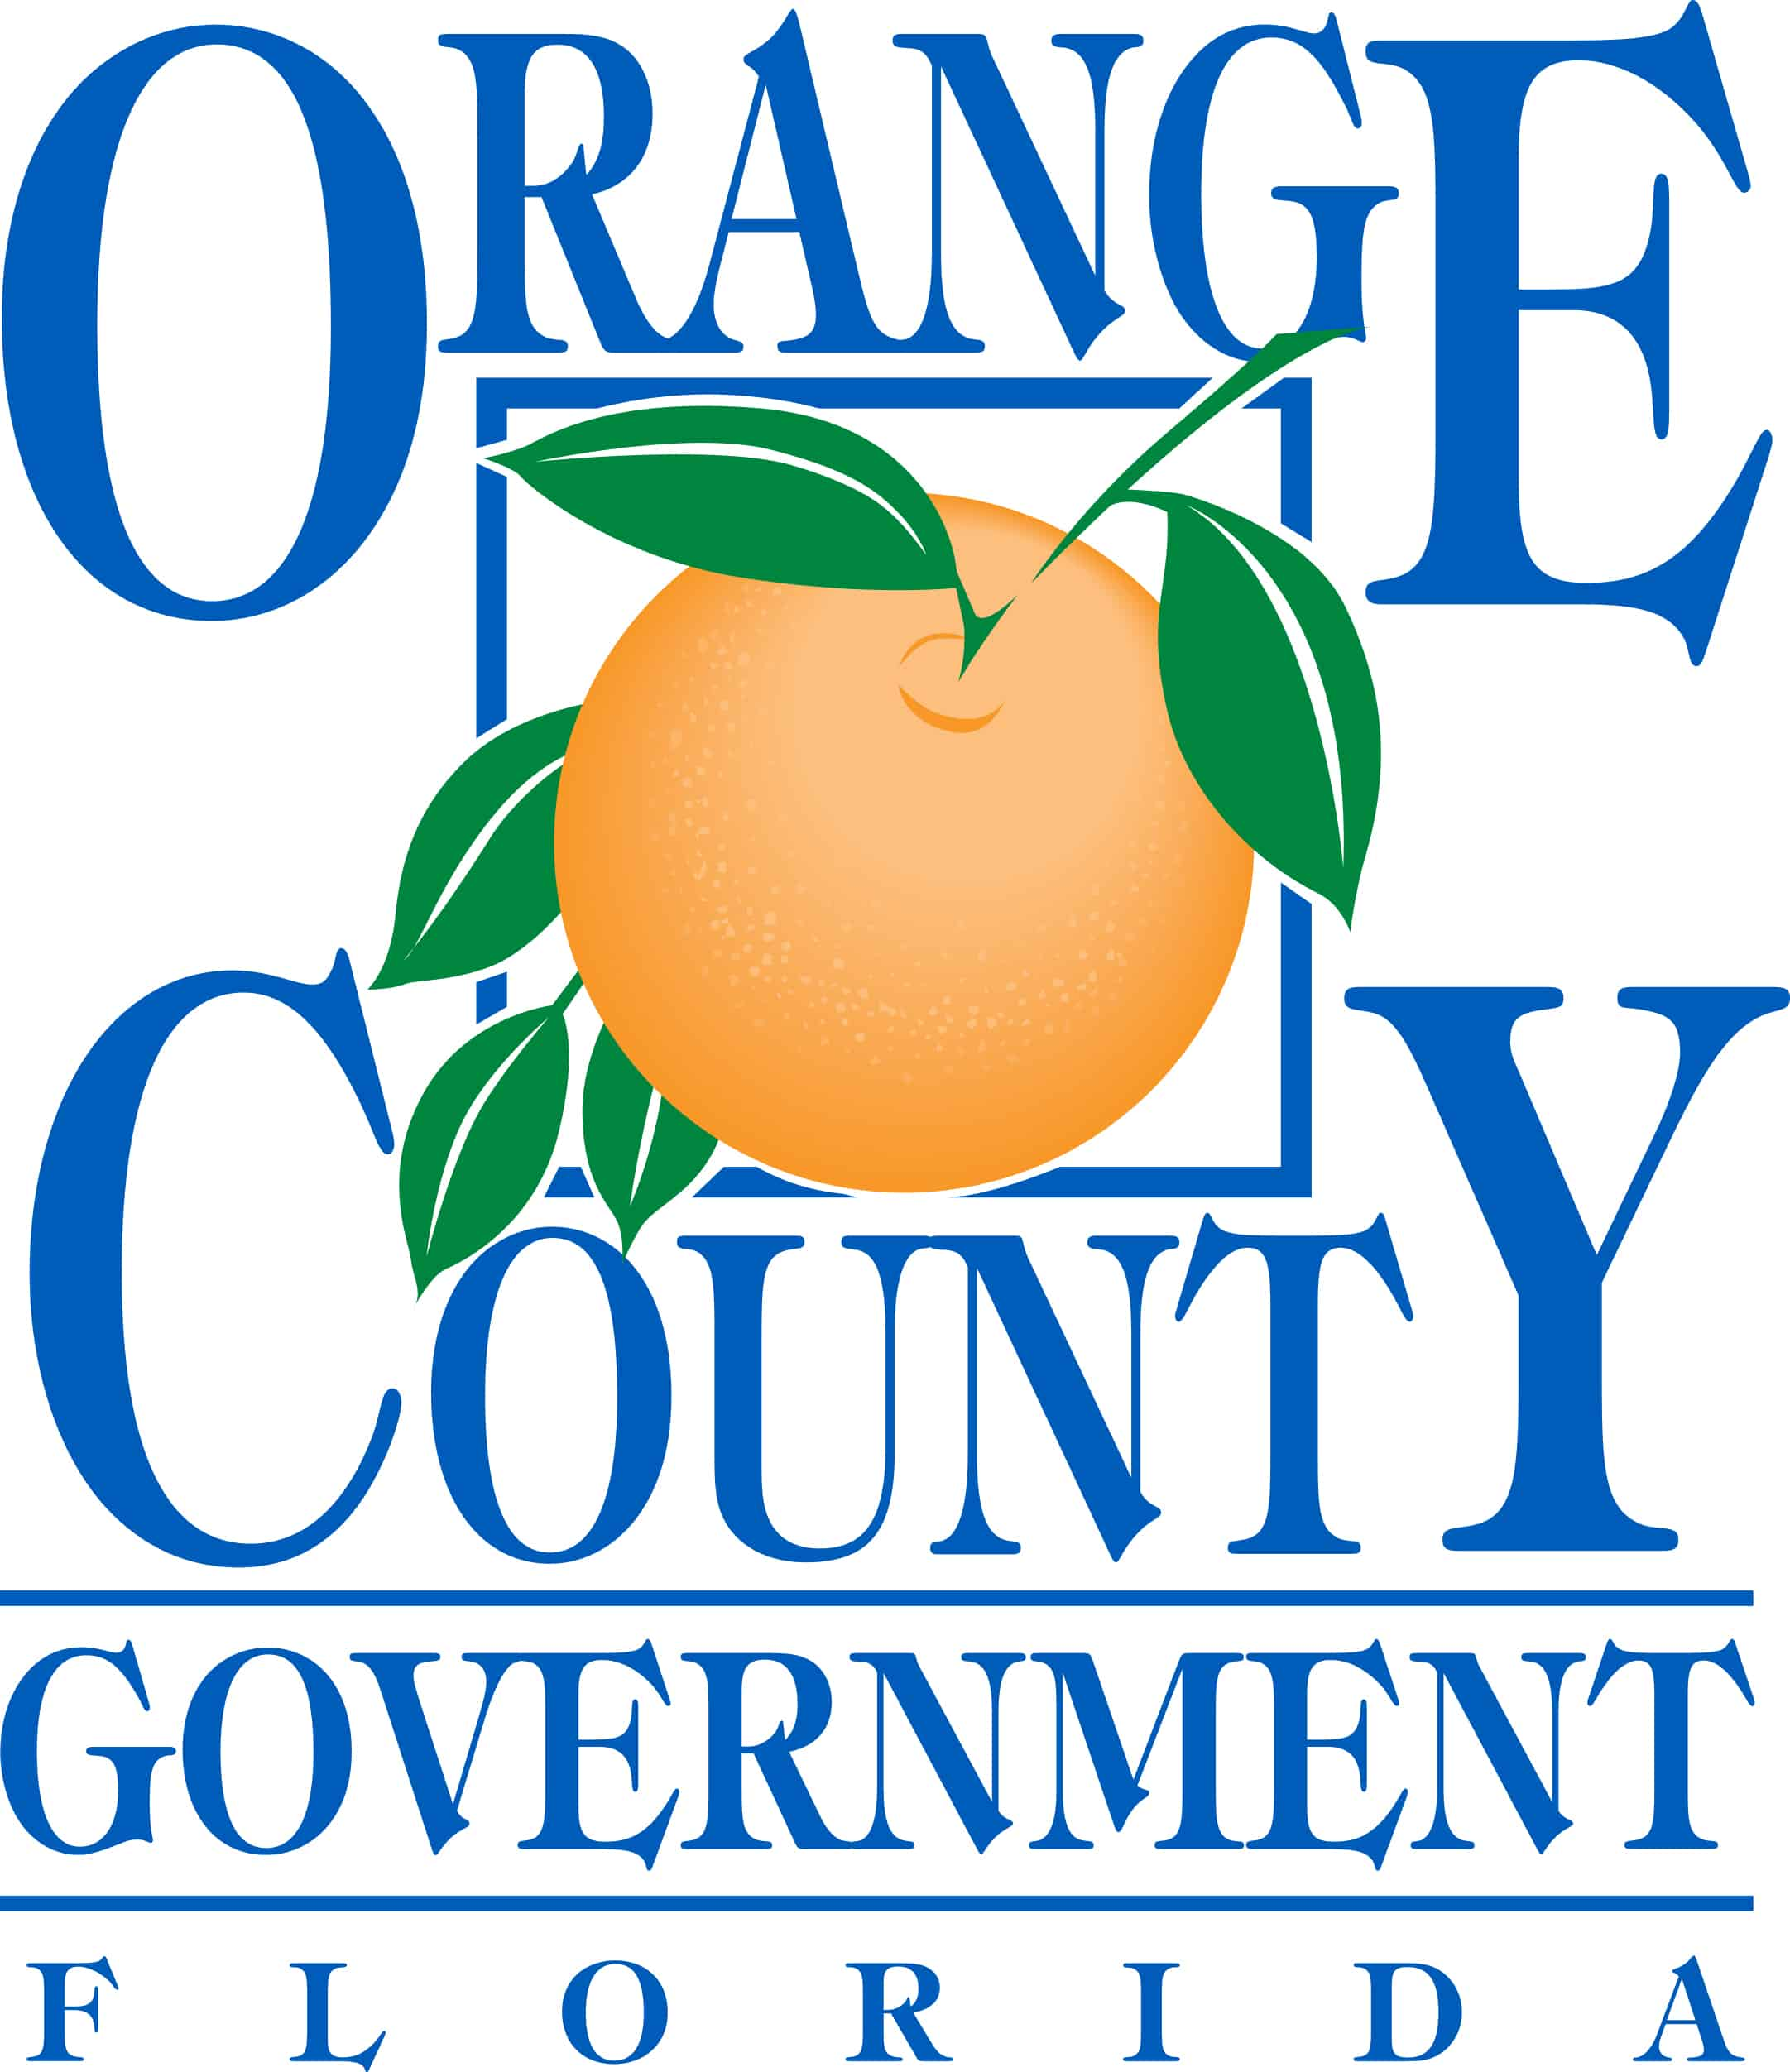 Orange County Government Florida company name